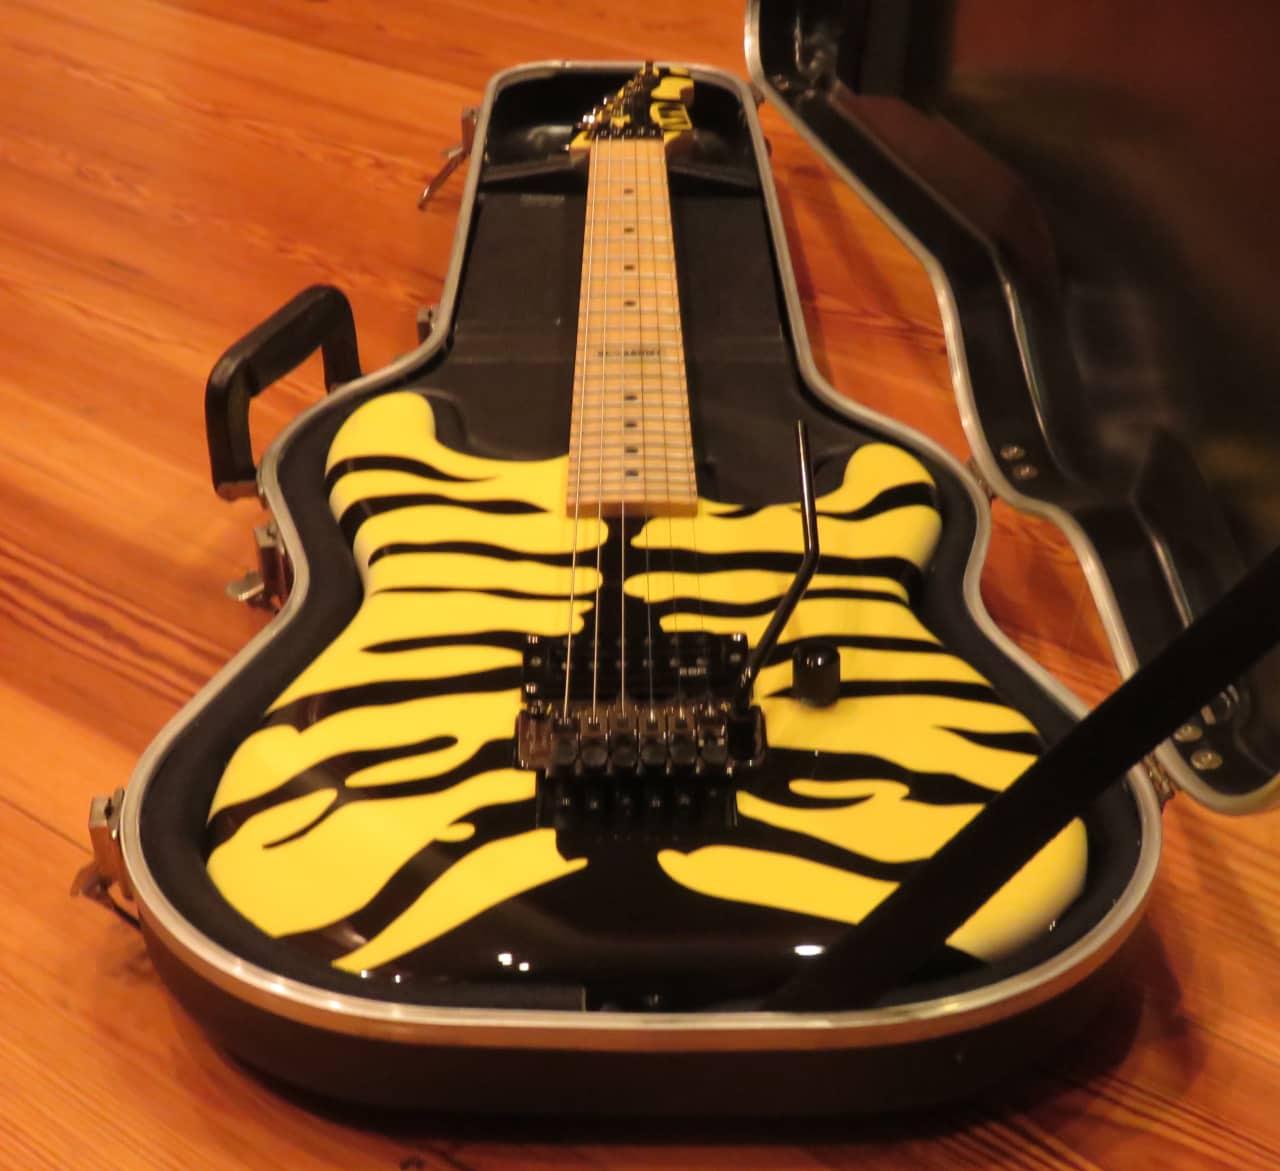 esp ltd george lynch signature gl200mt m1 tiger guitar reverb. Black Bedroom Furniture Sets. Home Design Ideas